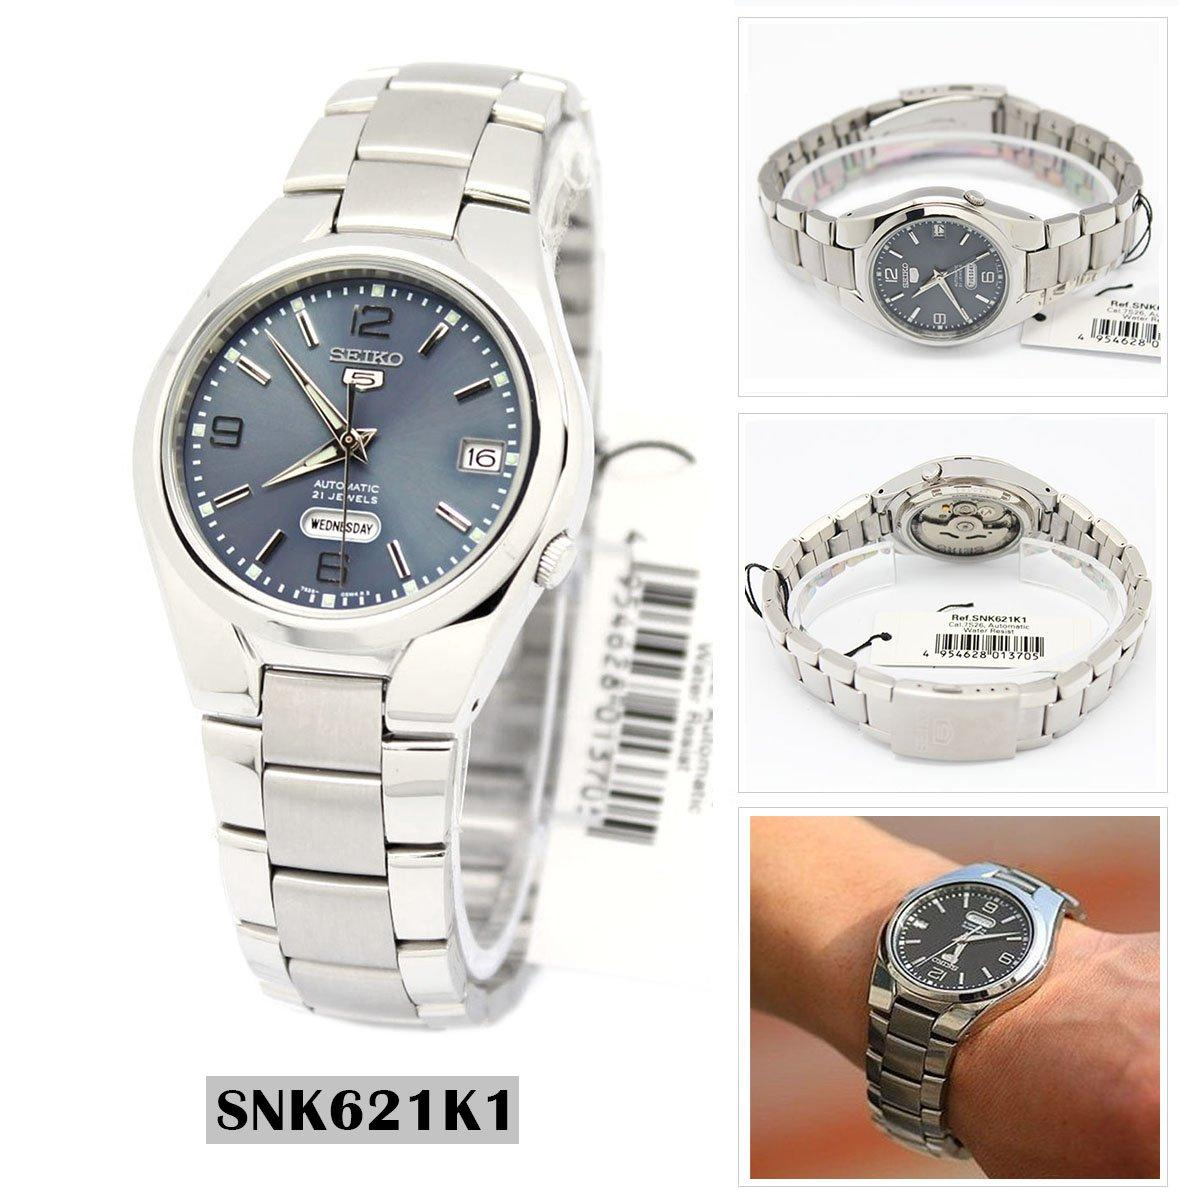 Seiko Seiko 5 Automatic Silver Stainless Steel Case Stainless Steel Bracelet Mens Snk621K1 Shop